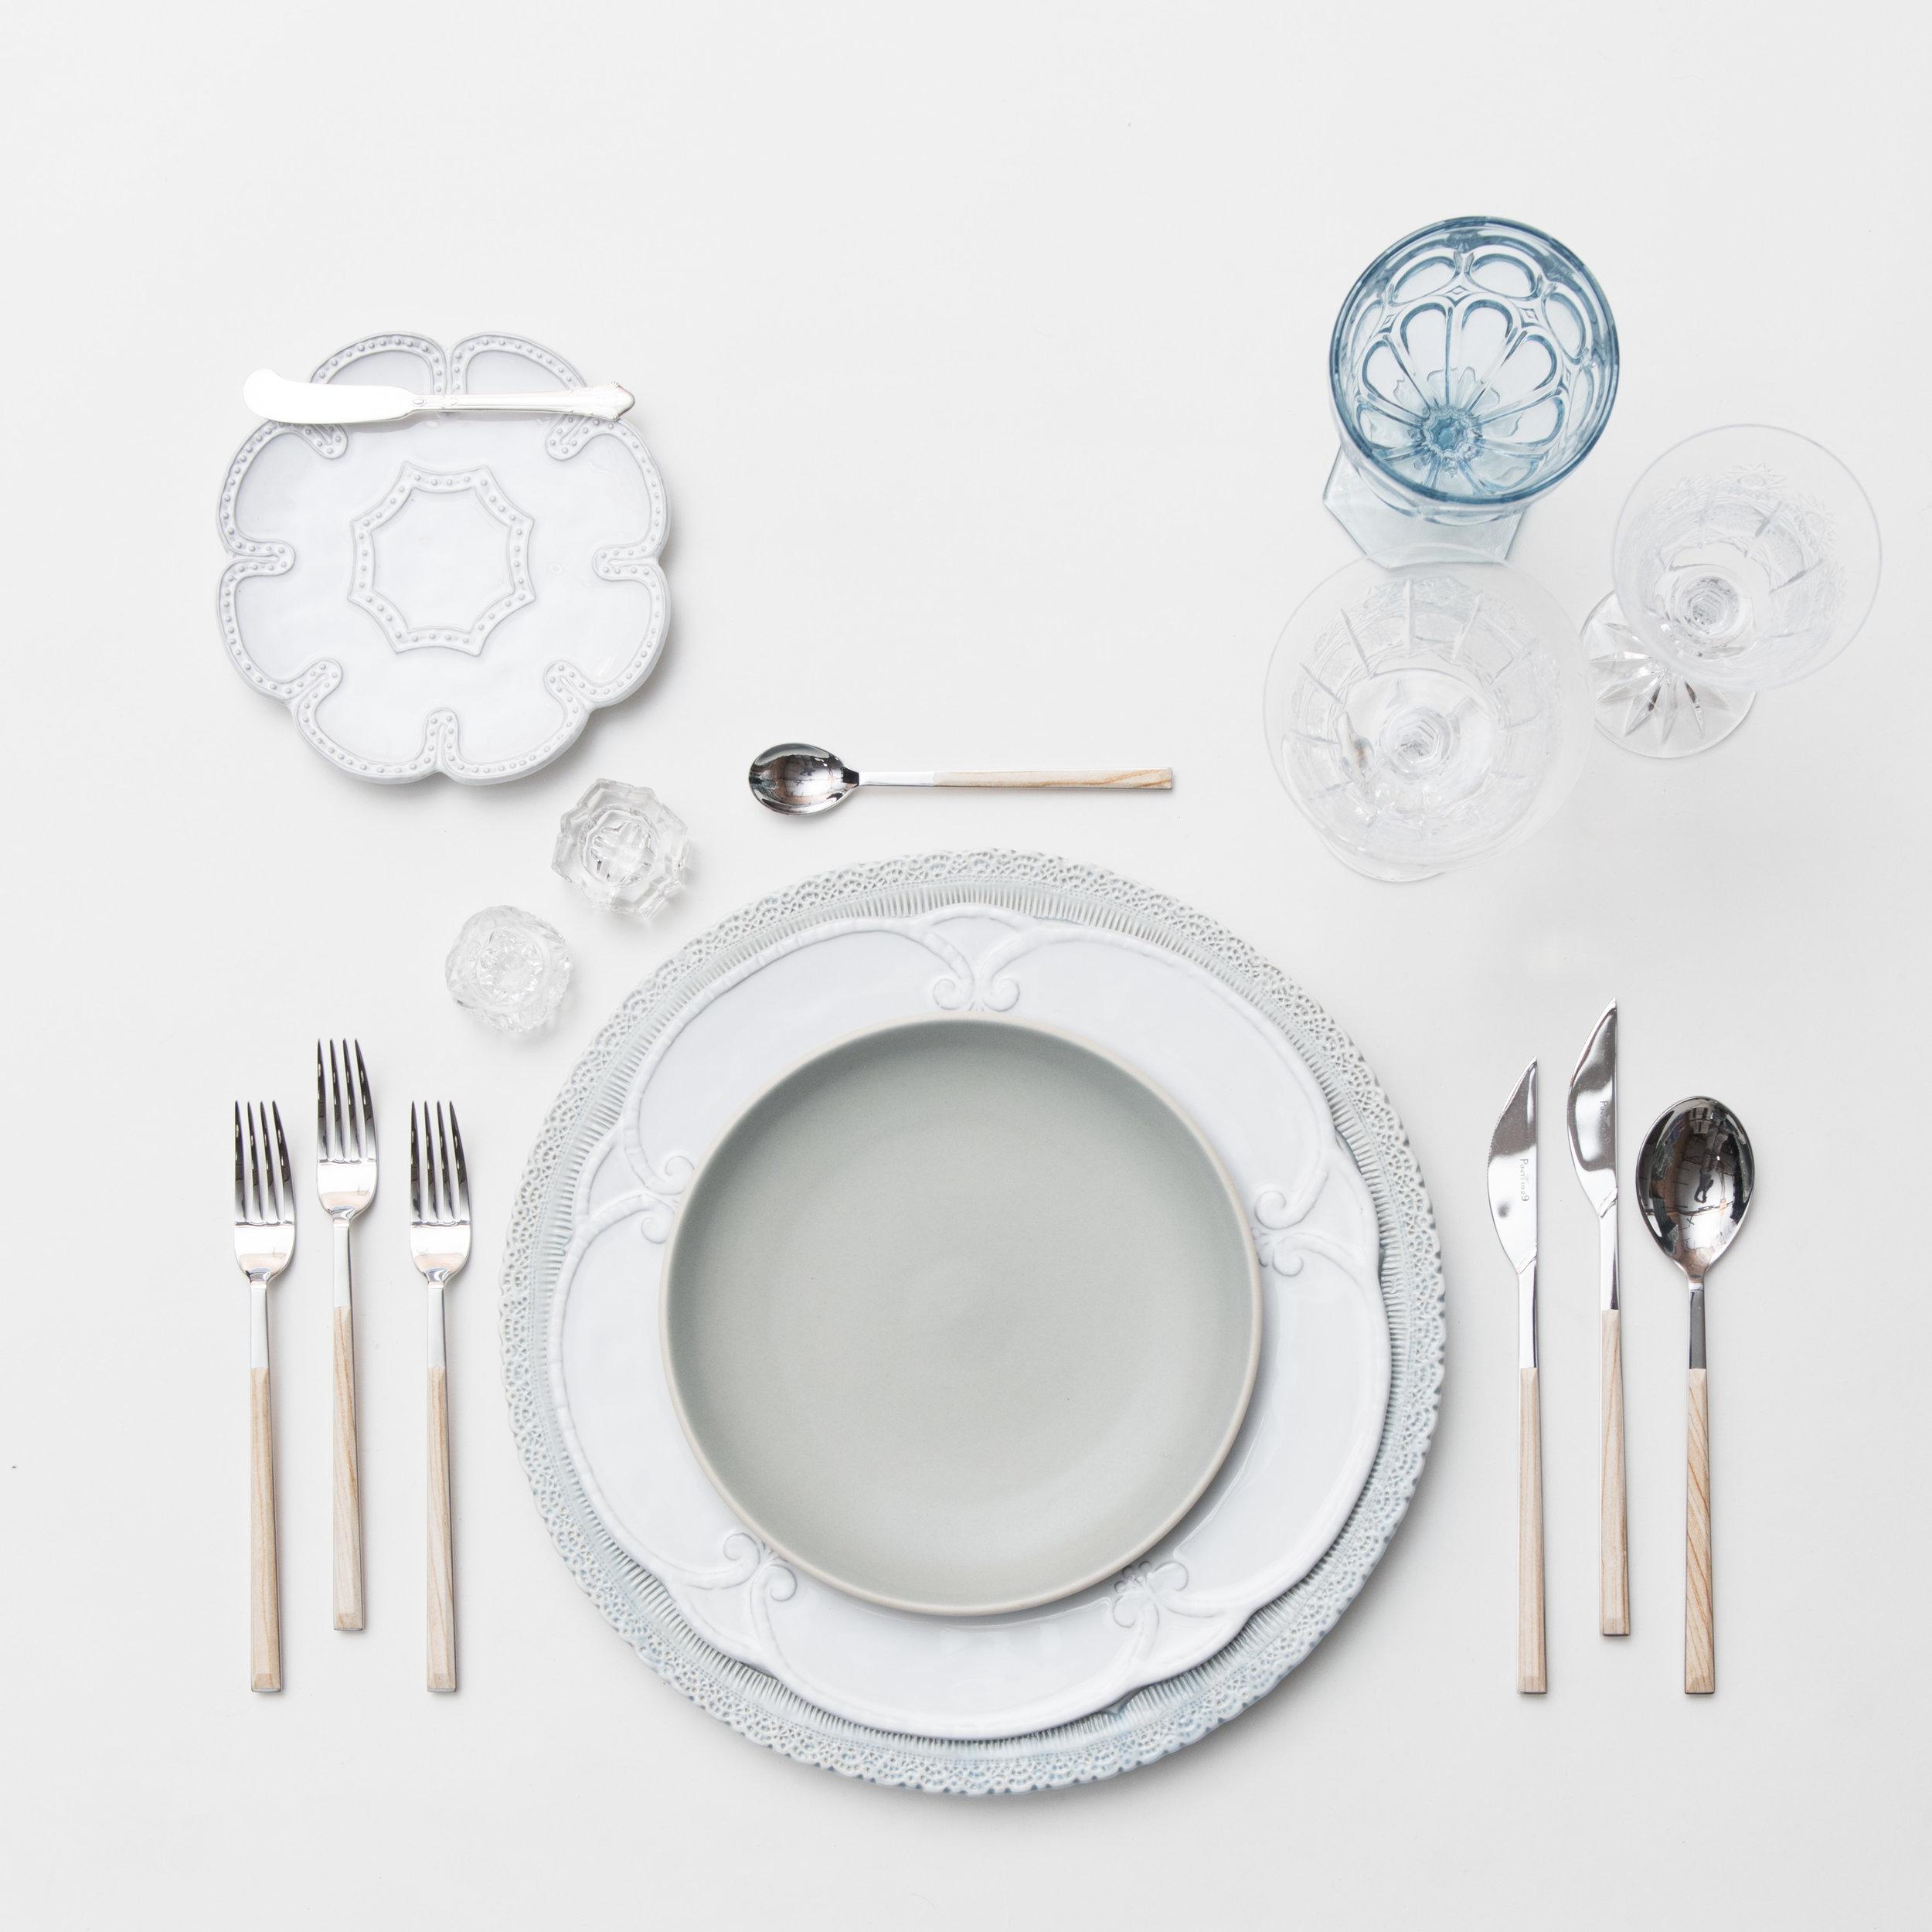 RENT: Lace Chargers in Dusty Blue + Signature Collection Dinnerware + Heath Ceramics in Mist + Danish Flatware in Birch + Light Blue Vintage Goblets + Czech Crystal Stemware + Antique Crystal Salt Cellars